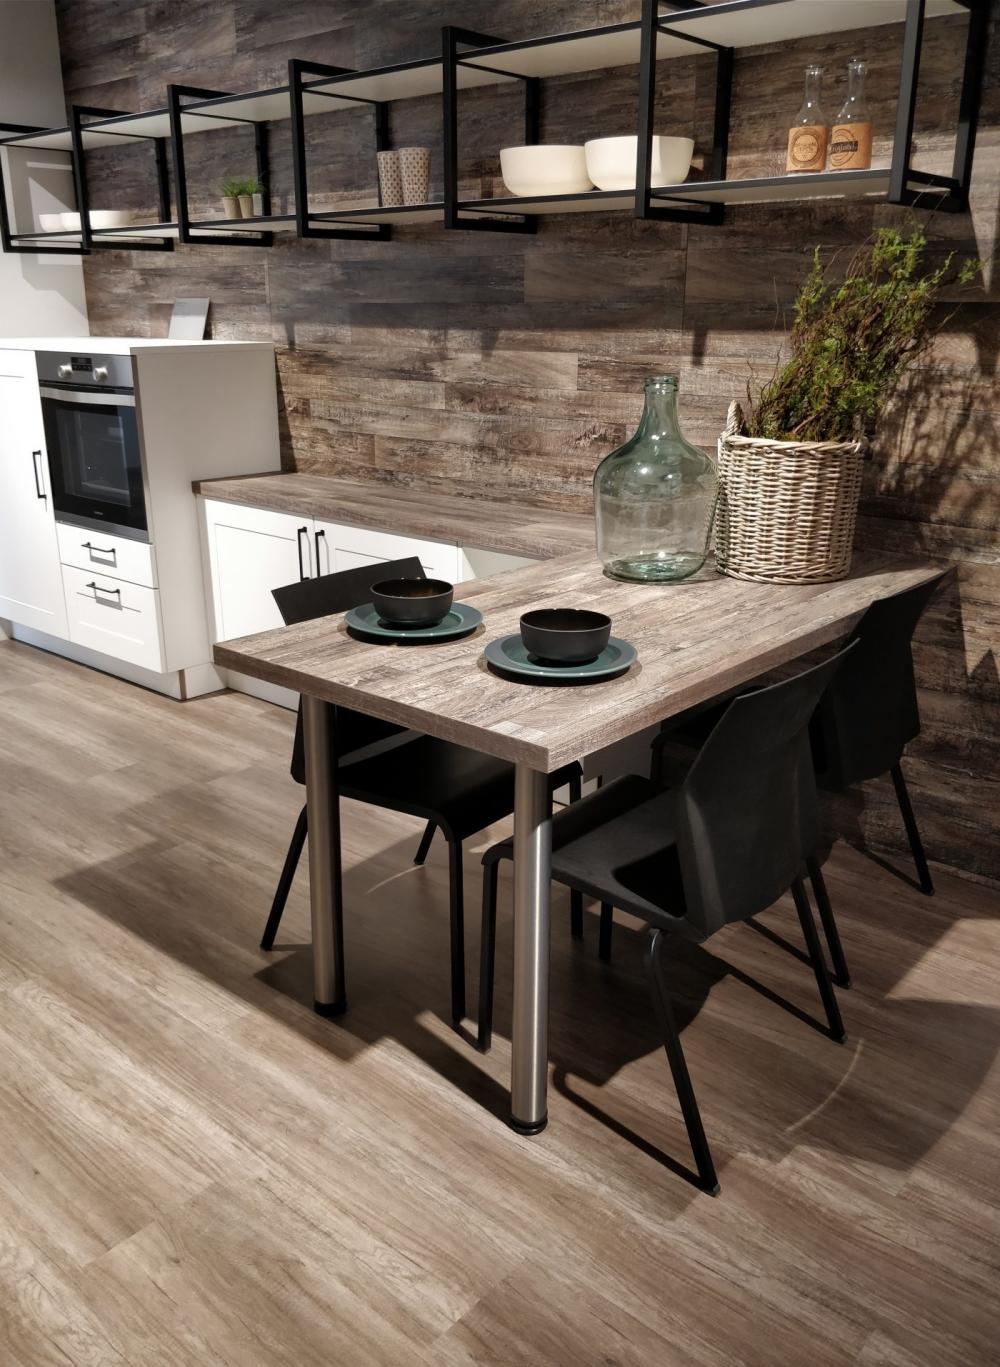 pavimento e rivestimento per cucina